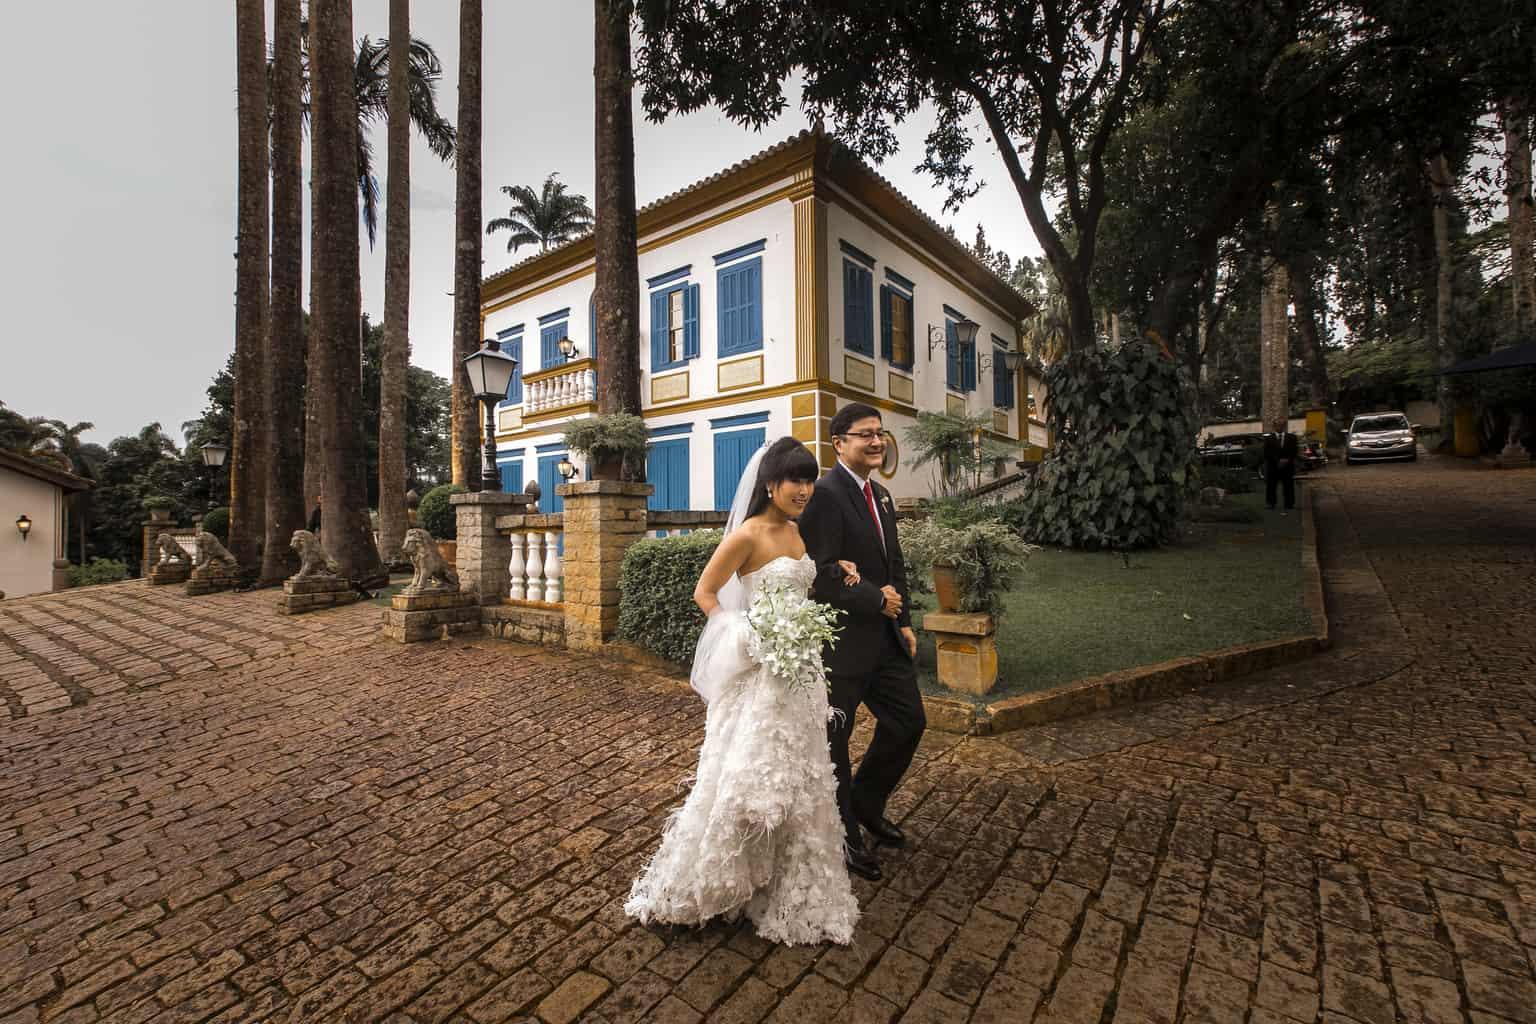 Fernanda-e-Max-Fazenda-Santa-Barbara-Foto-Torin-Zanette-Fabio-e-Telma-Decorações-cerimonia-1430